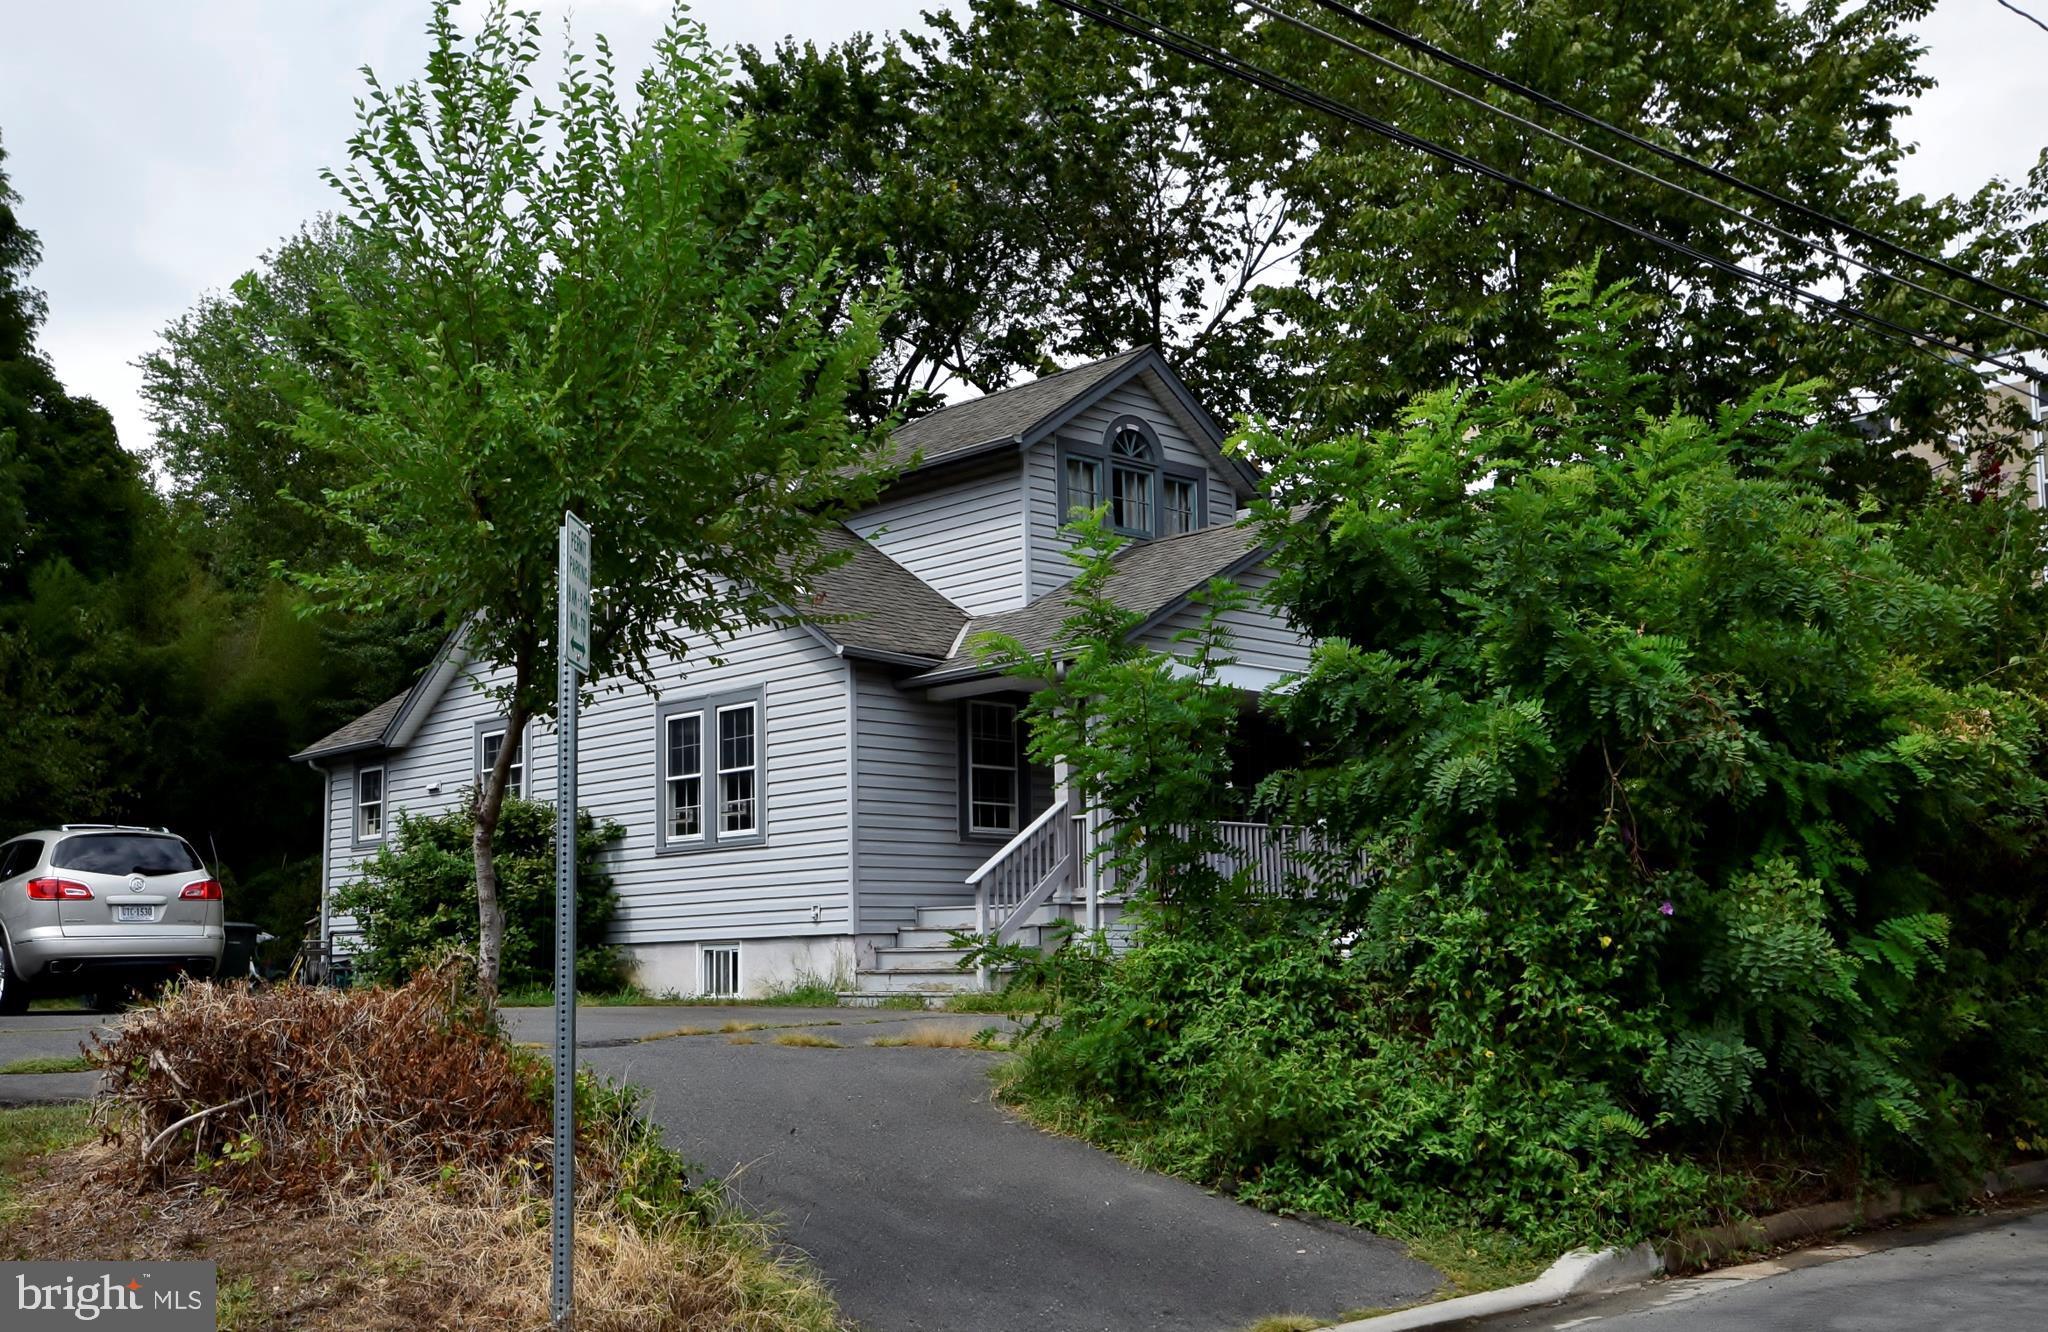 106 S LEE STREET, FALLS CHURCH, VA 22046